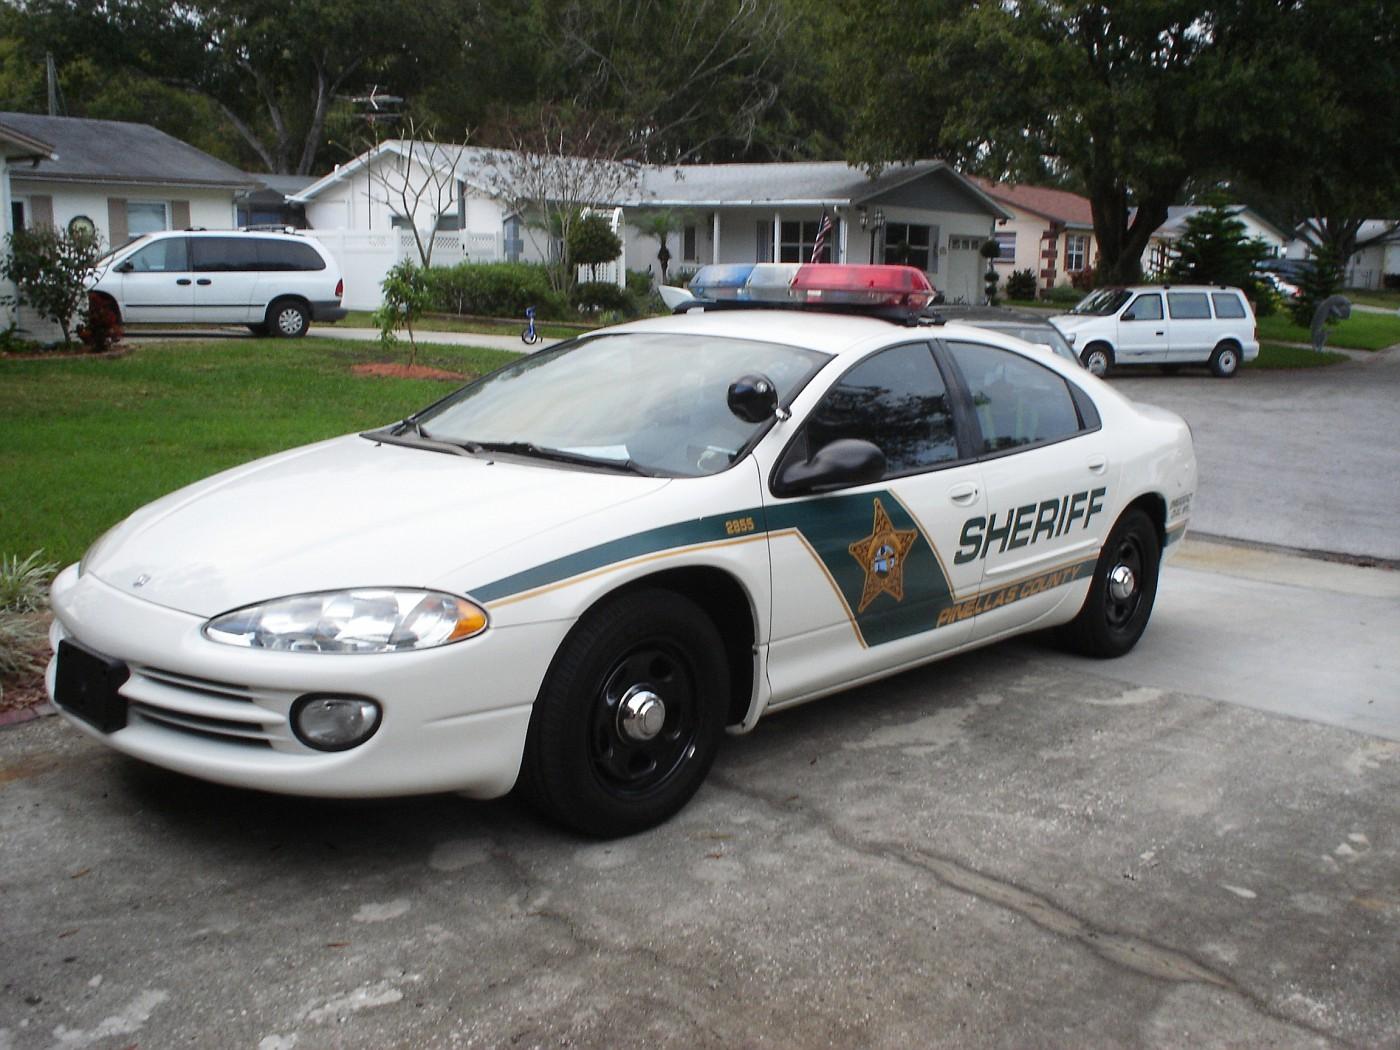 Photo: FL - Pinellas County Sheriff | Florida album | copcar